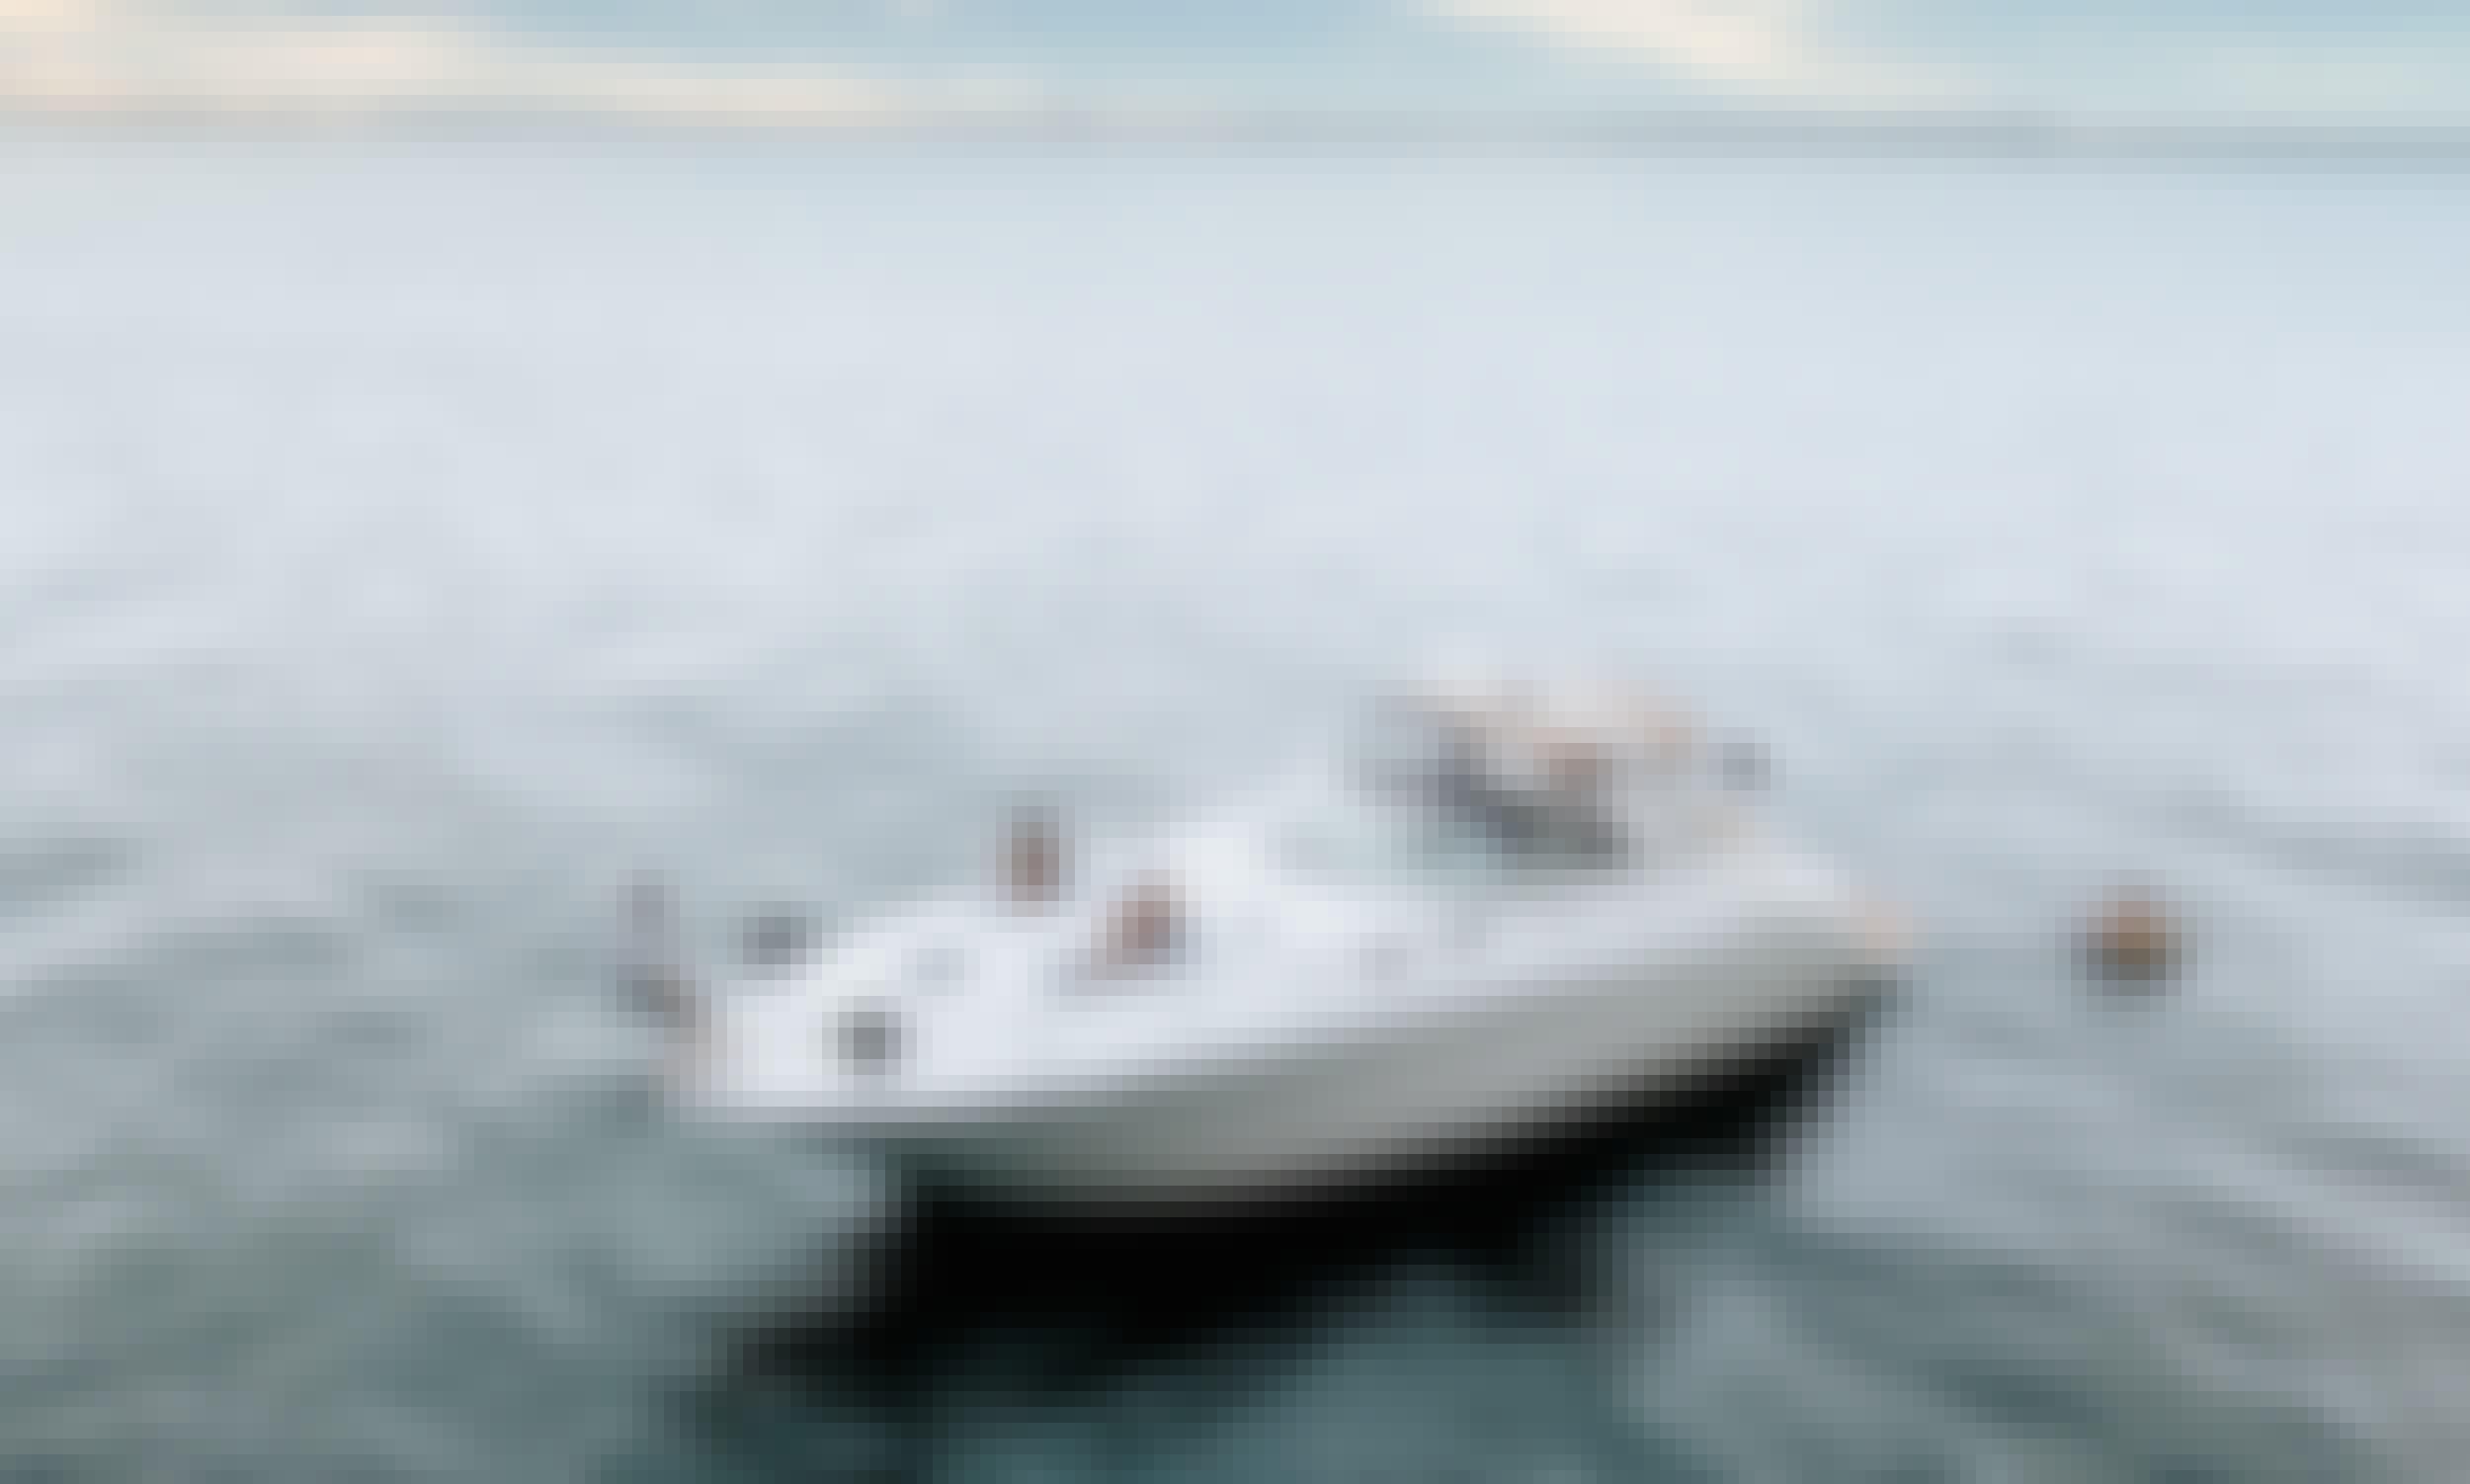 42' Sea Ray Sundancer Motor Yacht in Miami Beach, Florida!